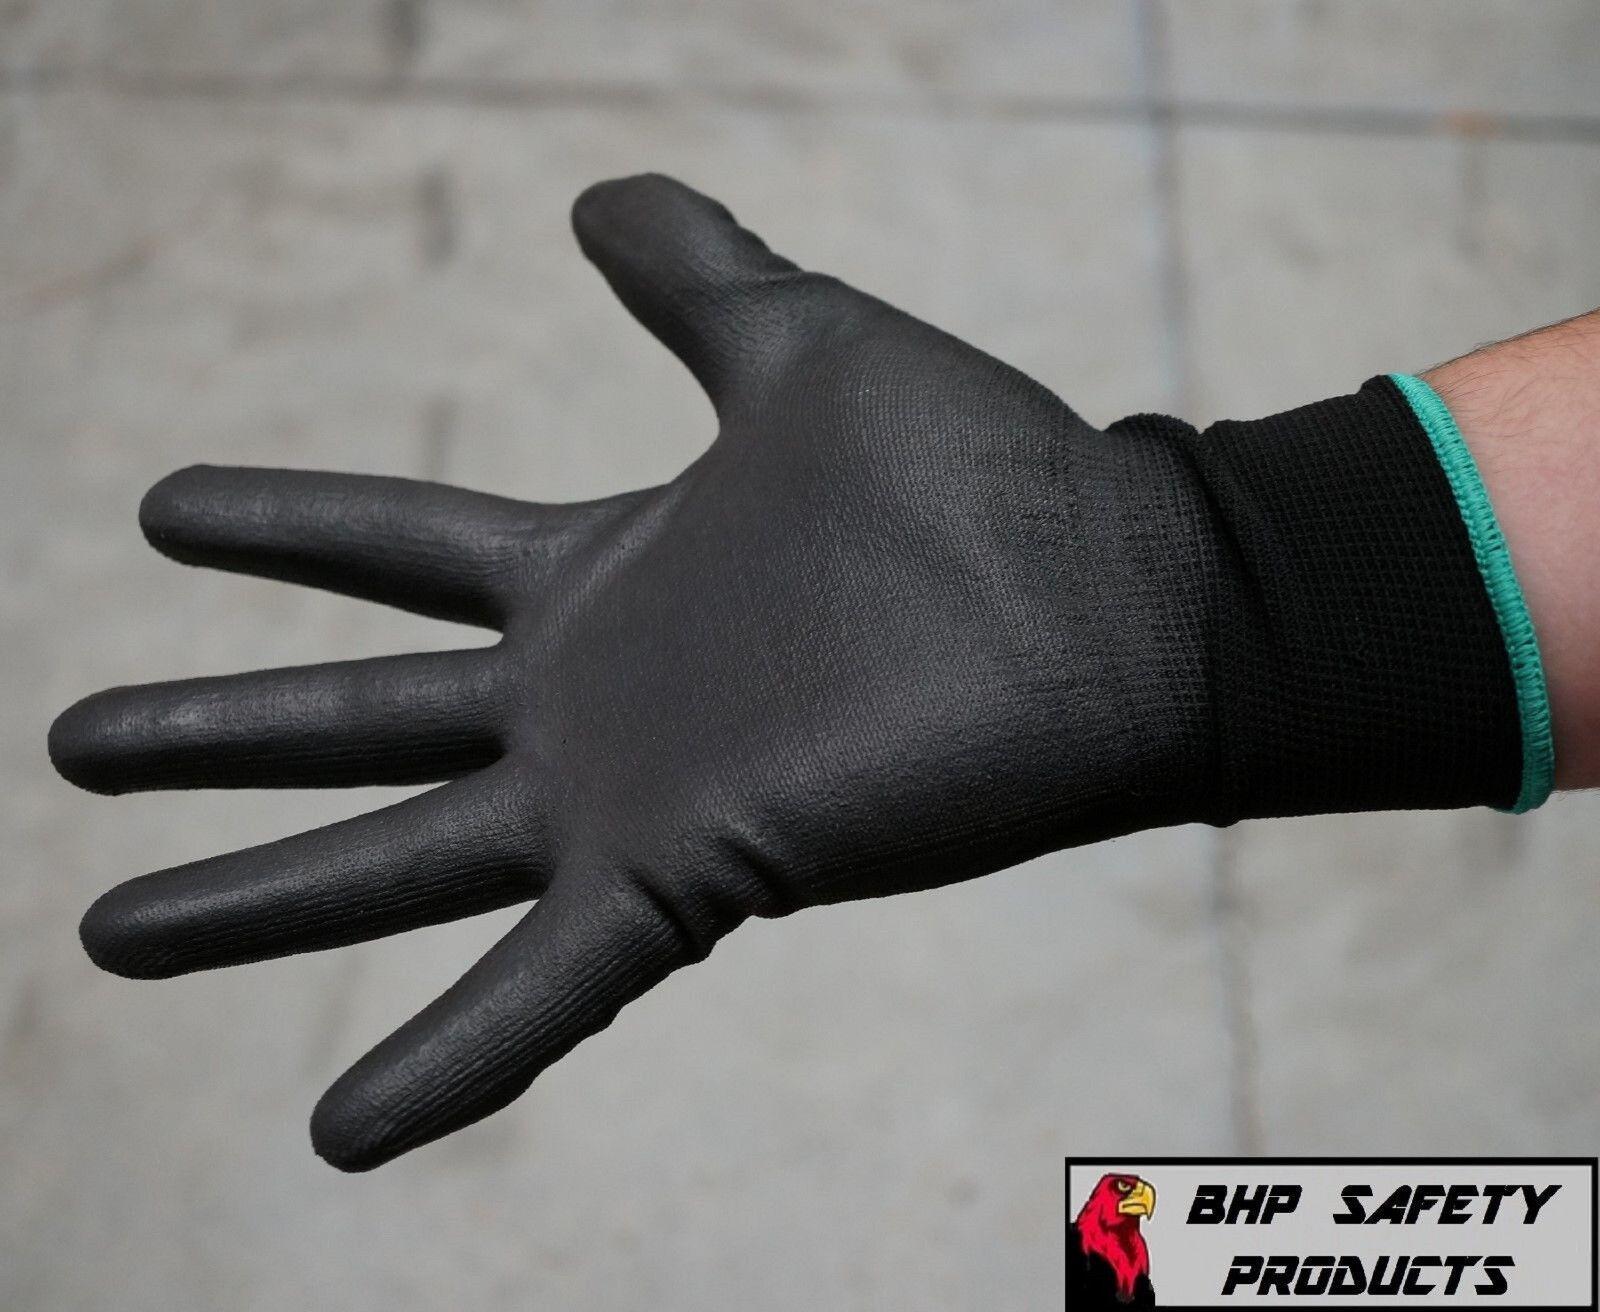 Купить Global Glove PUG17 - GLOBAL GLOVE PU POLYURETHANE COATED WORK GLOVES 12 PAIR PUG17 (S,M, L, AND XL)